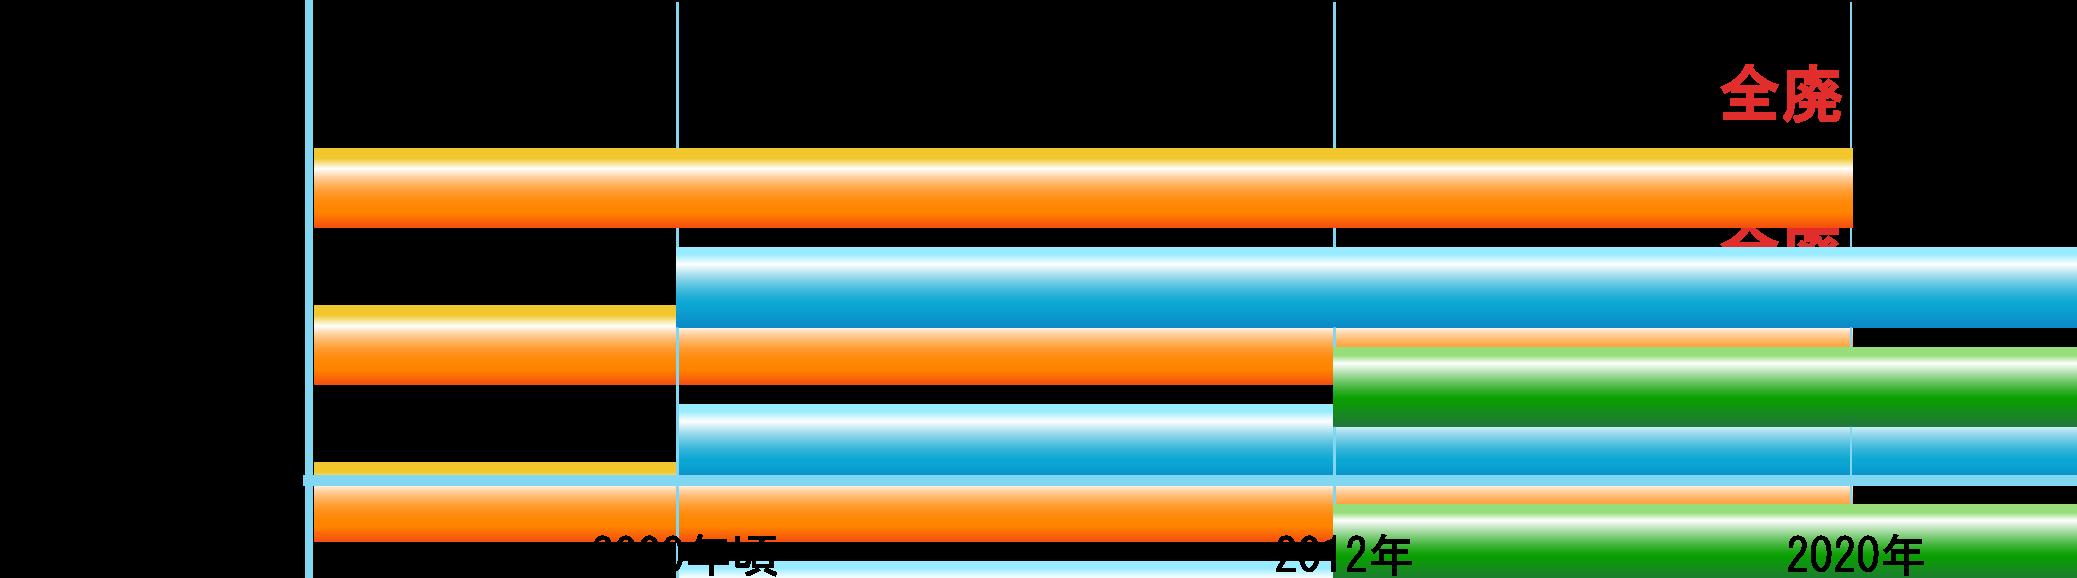 %e3%82%ac%e3%82%b9%e3%81%ae%e6%ad%b4%e5%8f%b2